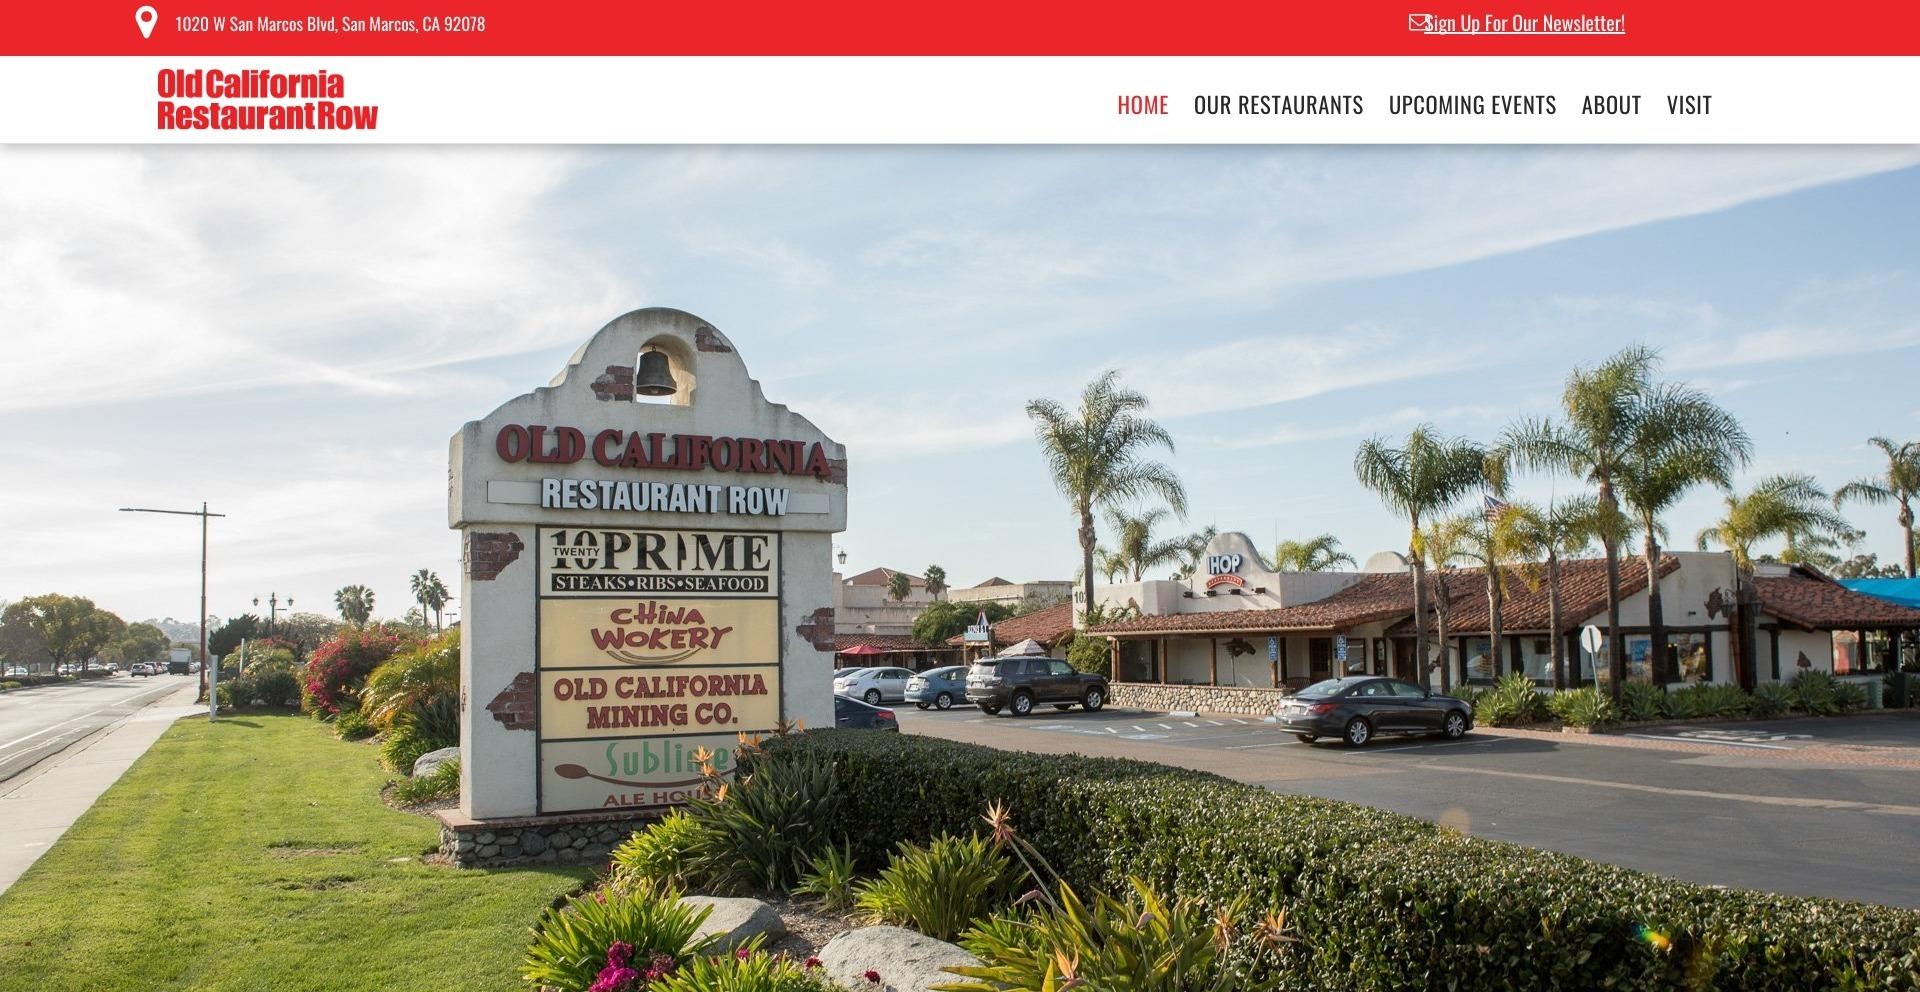 Old California Restaurant Row